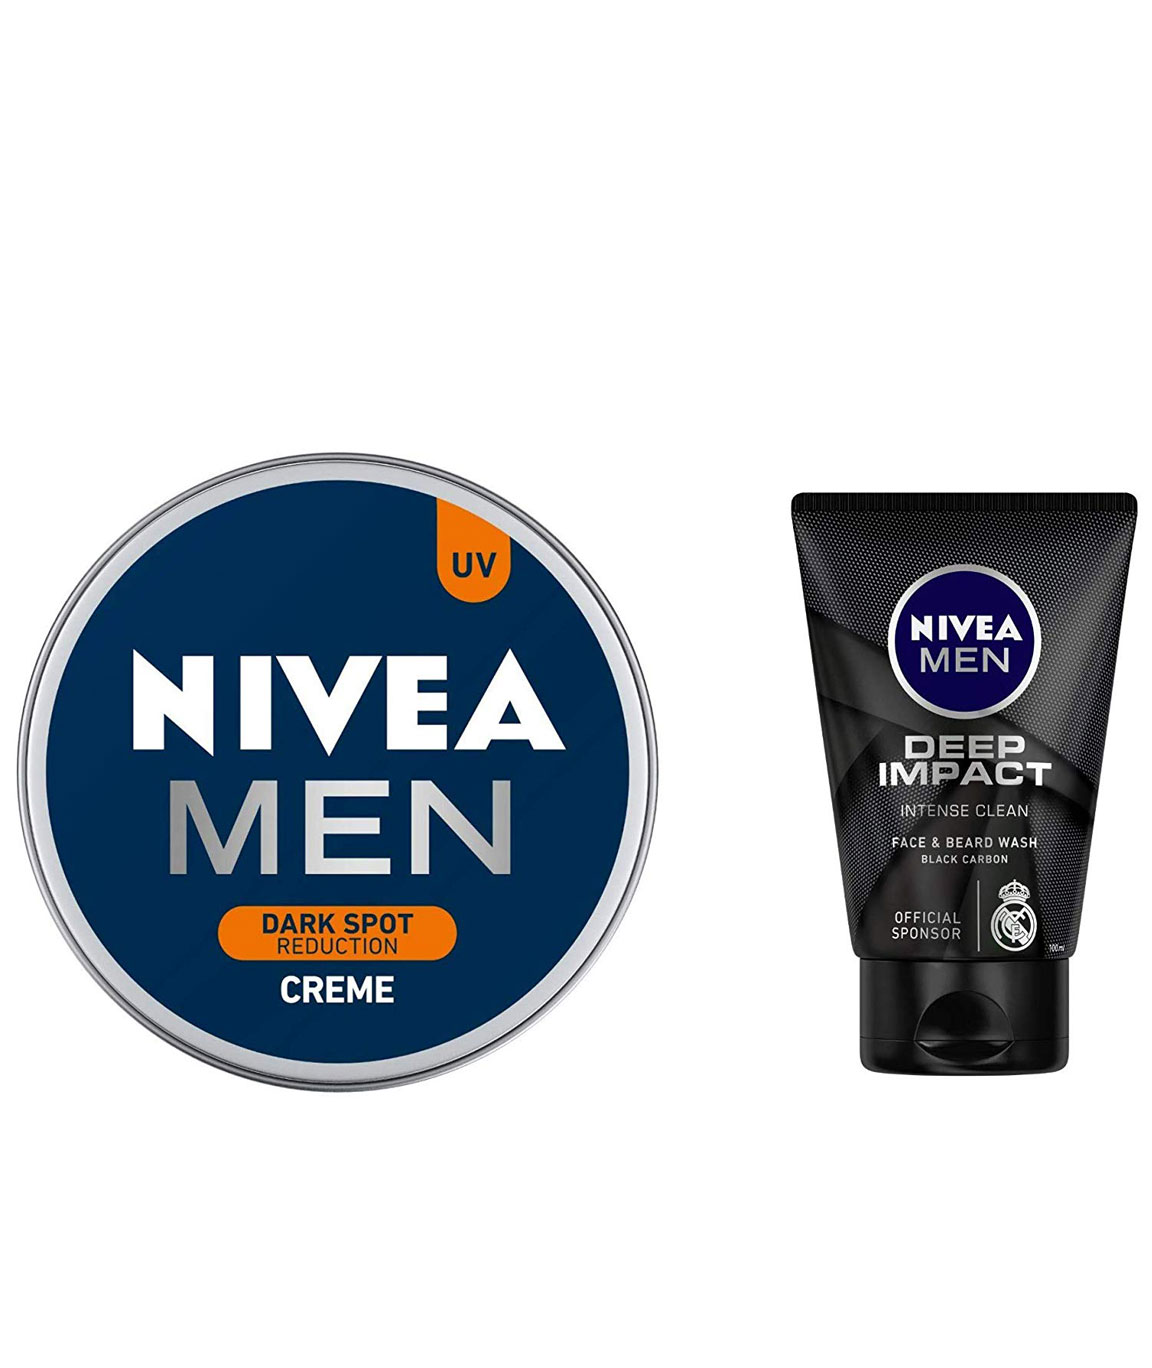 NIVEA MEN Cream, Dark Spot Reduction, 150ml and NIVEA MEN Face & Beard Wash, Deep Impact Intense Clean, 100ml